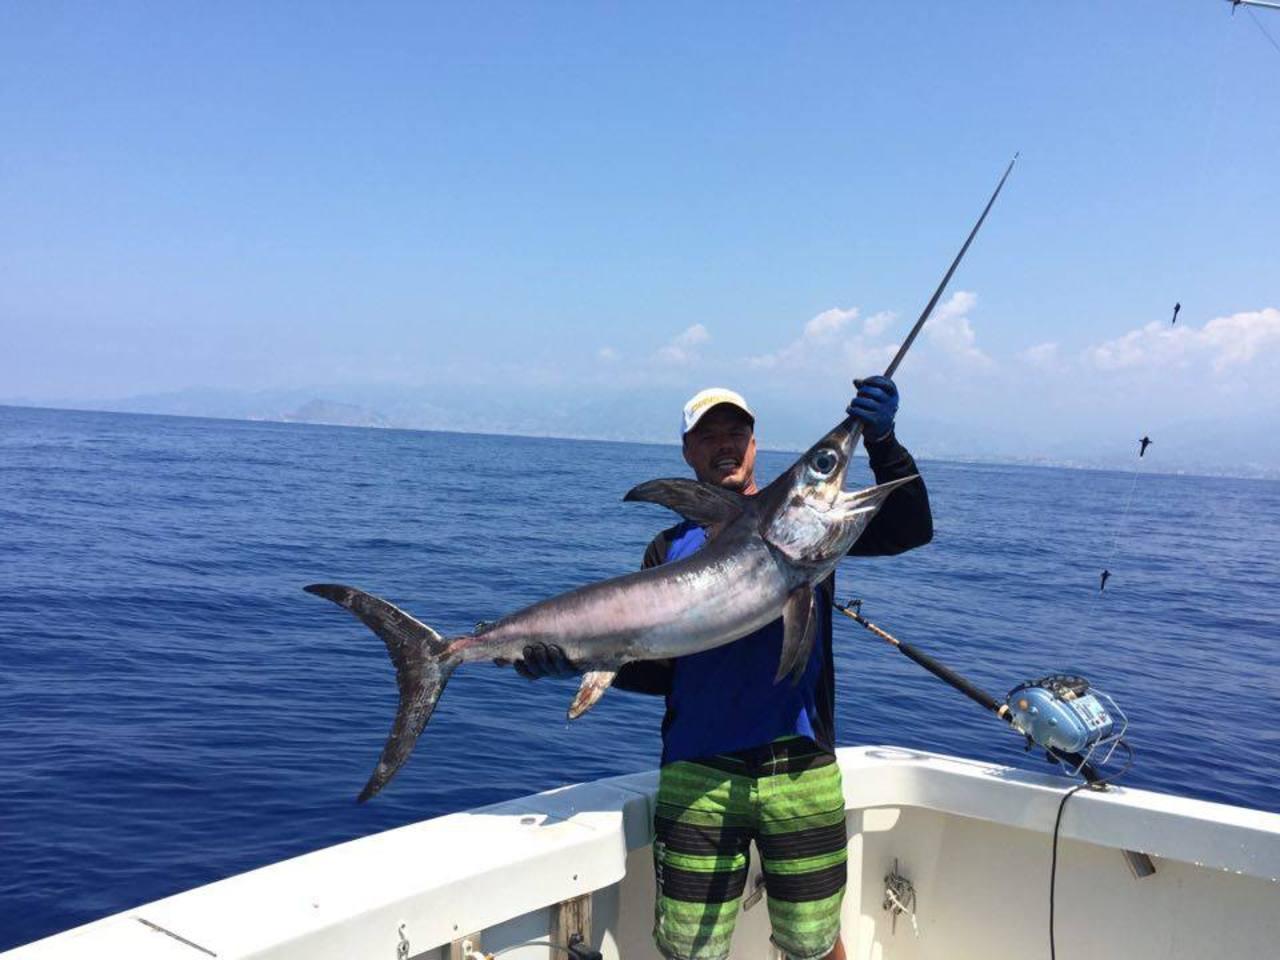 Professional fishing trip in Alanya photo 4843178